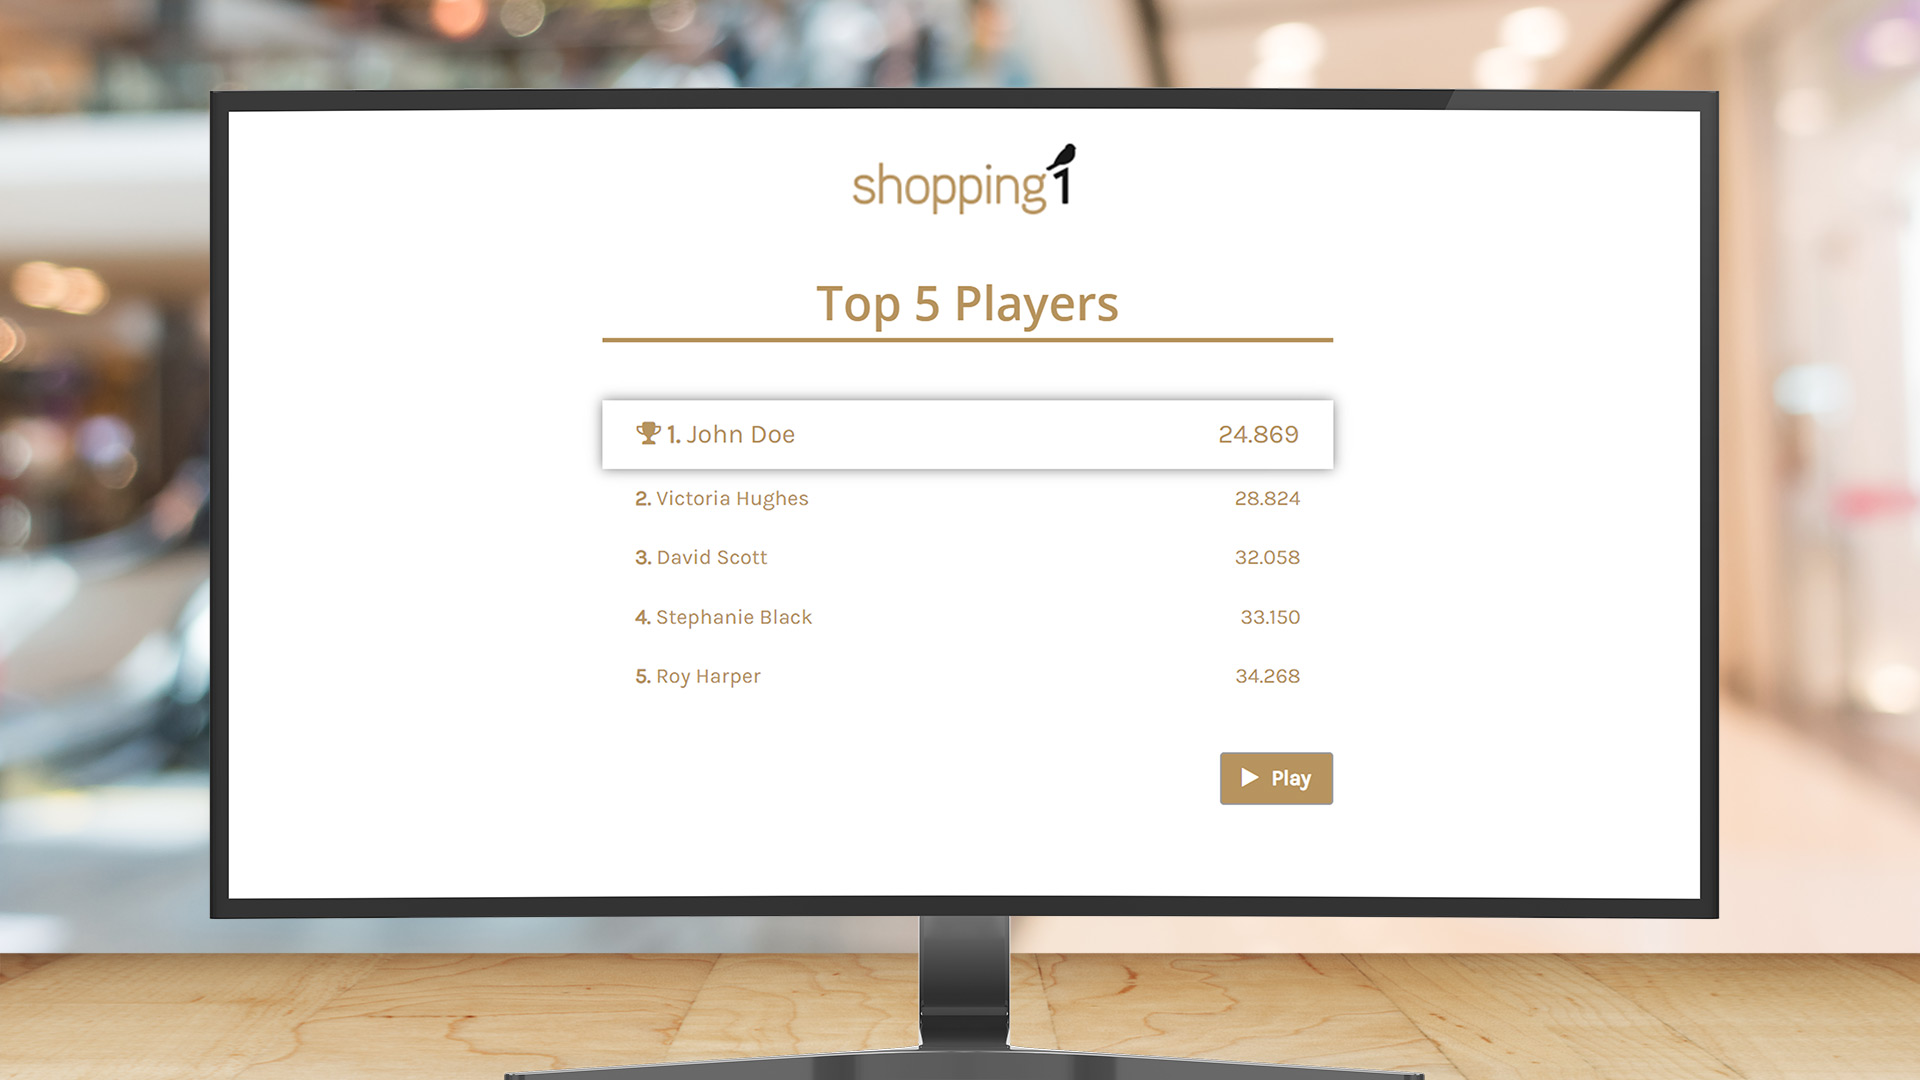 shopping center gamification use case image